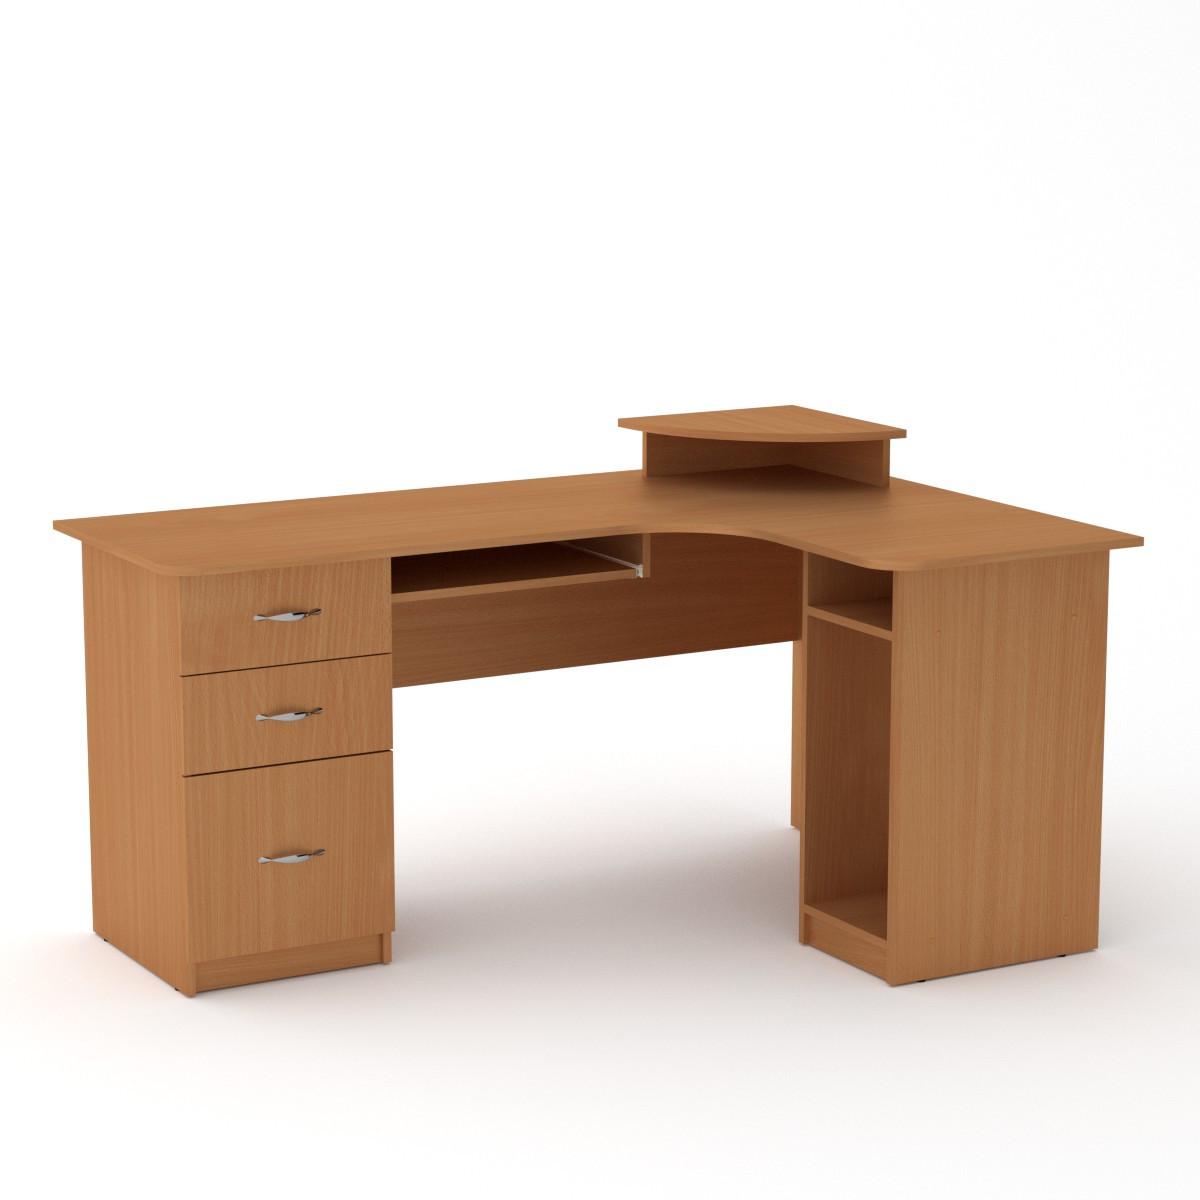 Стол компьютерный СУ-3 бук Компанит (160х110х87 см)